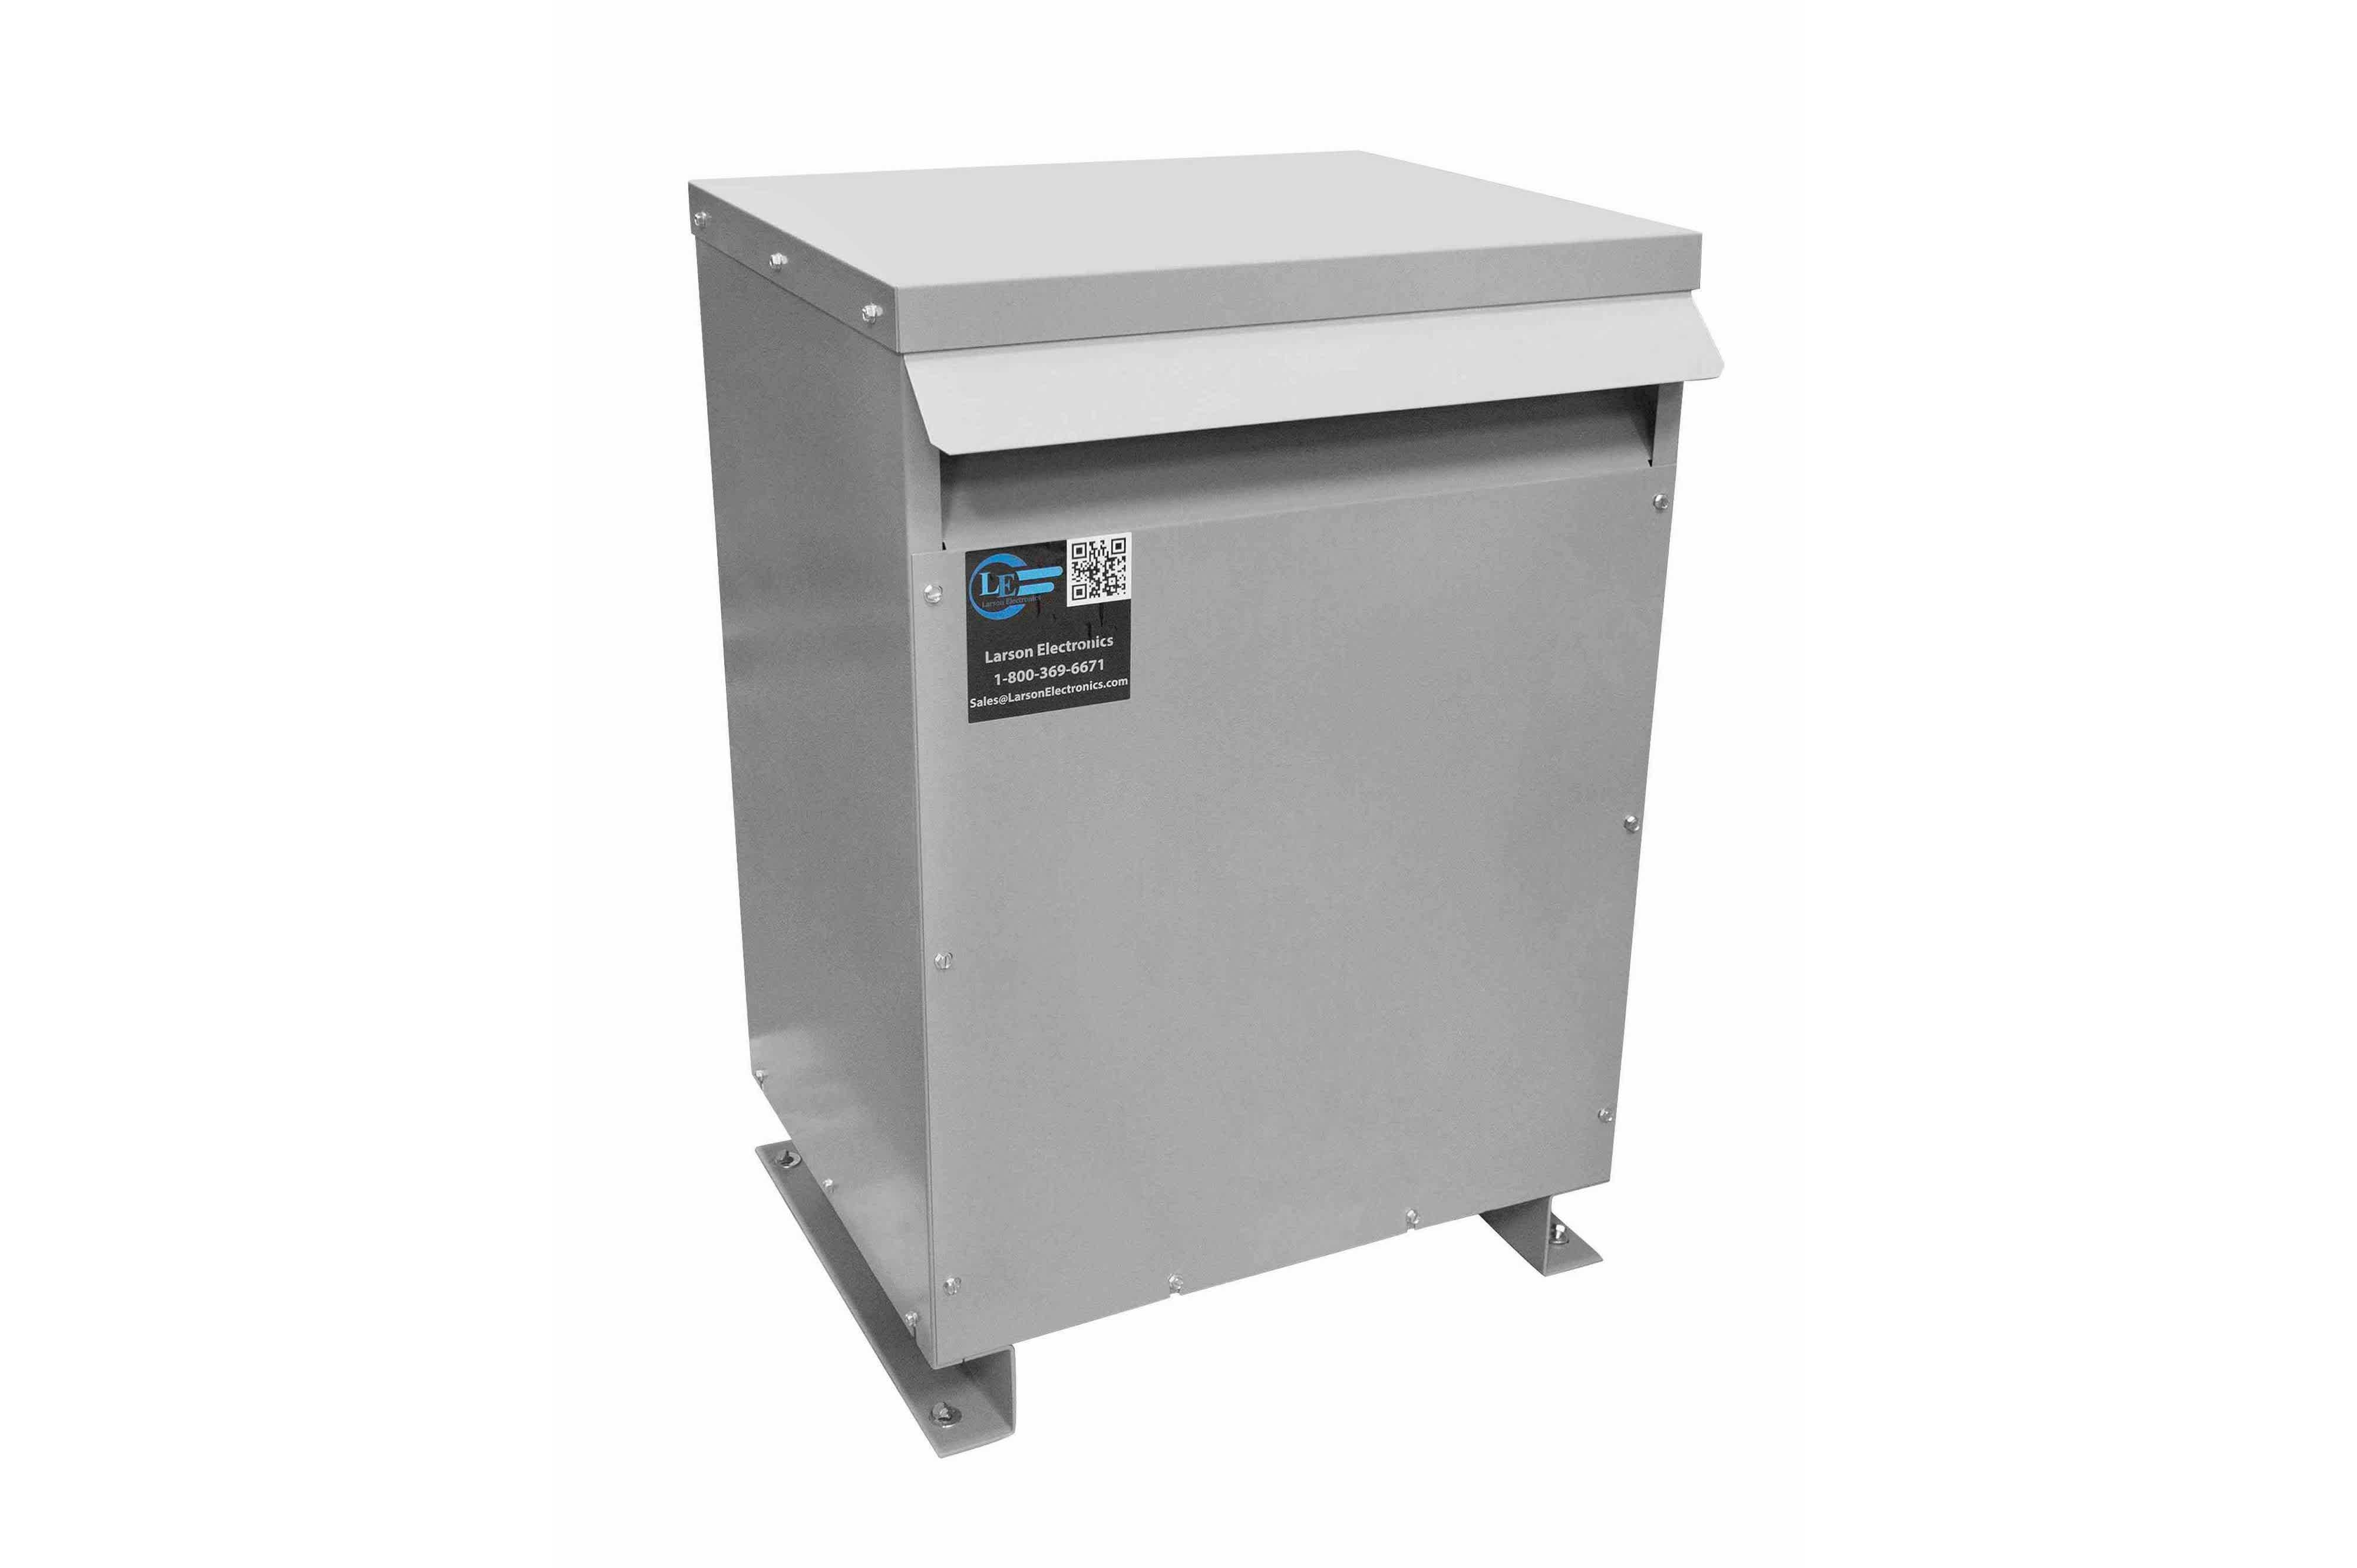 52.5 kVA 3PH Isolation Transformer, 415V Wye Primary, 240V/120 Delta Secondary, N3R, Ventilated, 60 Hz